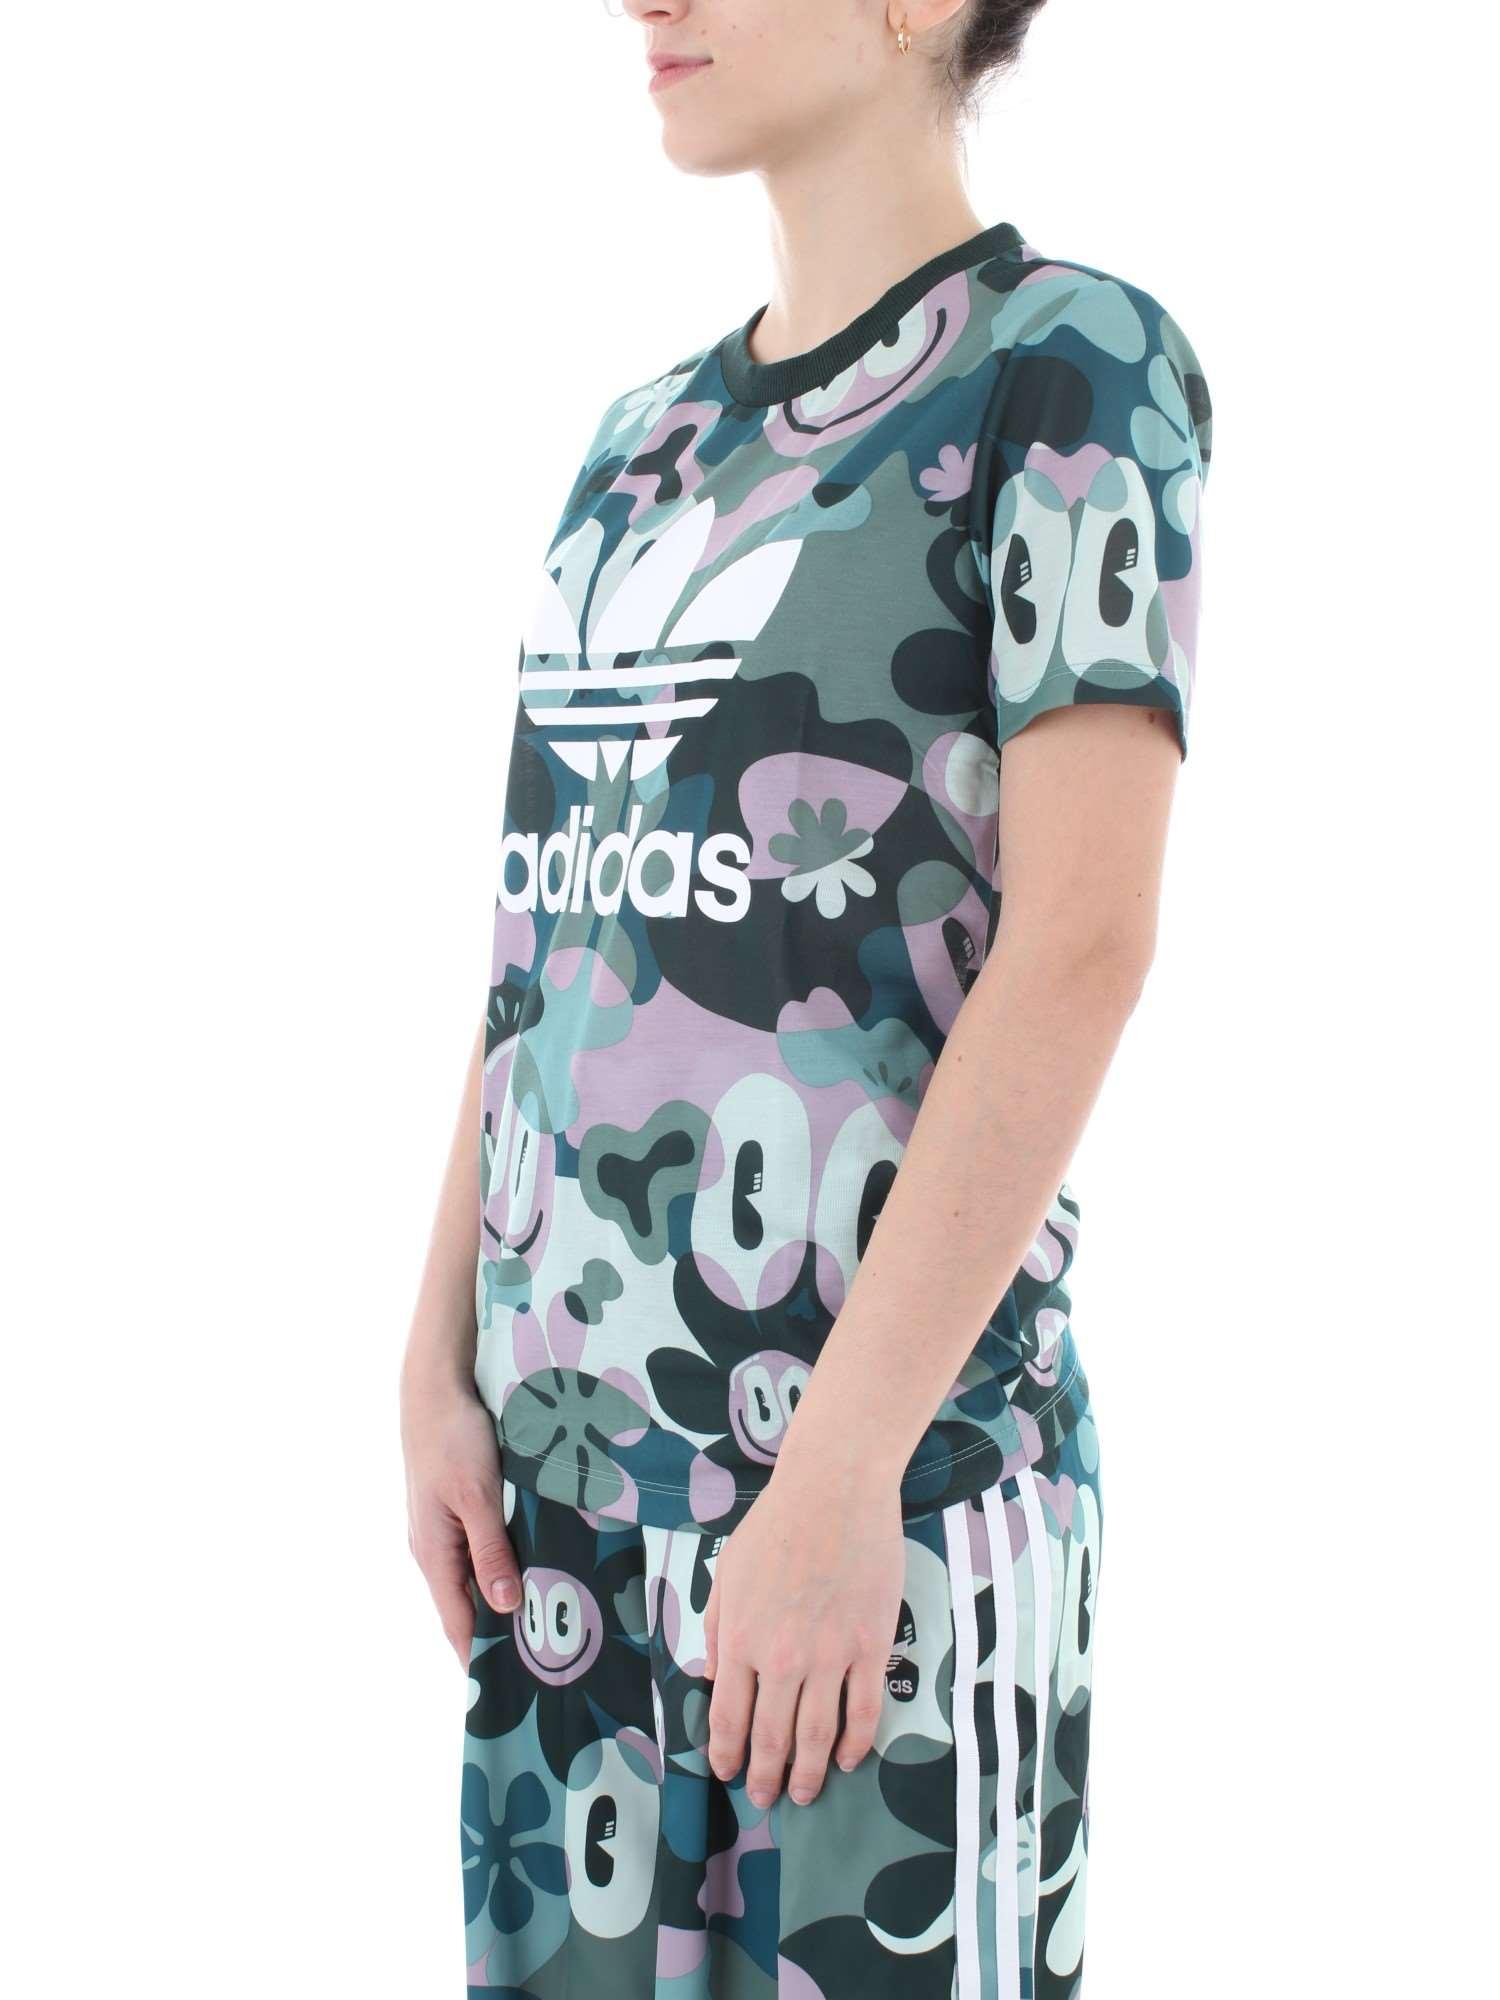 Dv2672 T Adidas Multi été shirt Printemps Femme RqvSv4xn